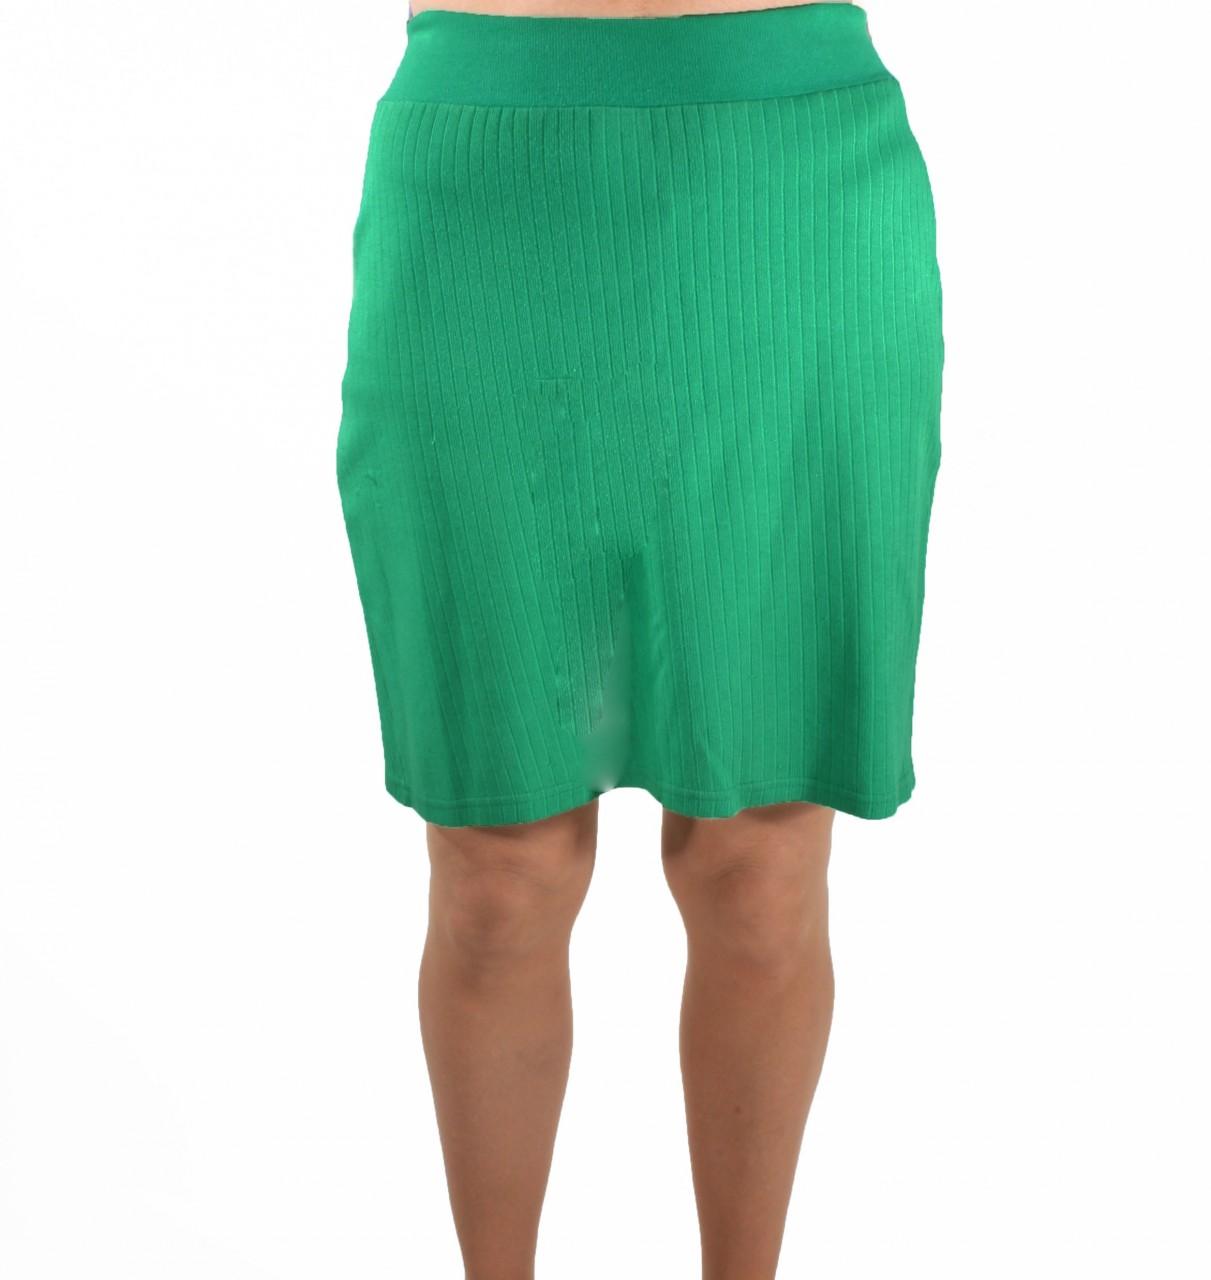 201 smaragdgrön rand